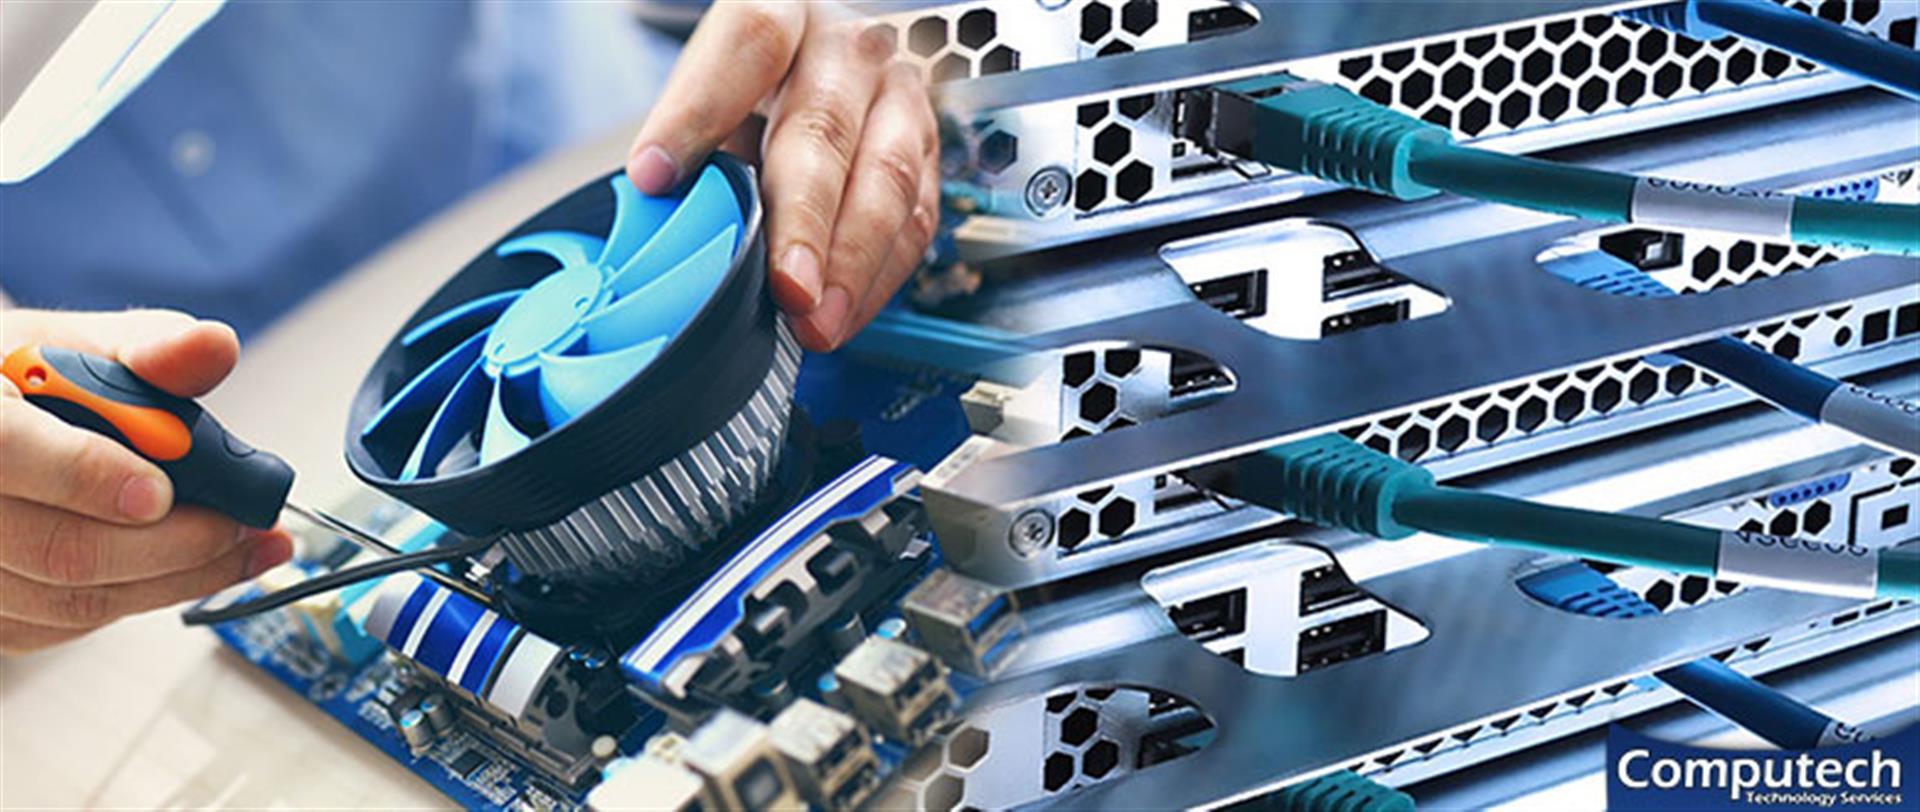 Petersburg Virginia On-Site Computer PC & Printer Repairs, Network, Voice & Data Cabling Solutions